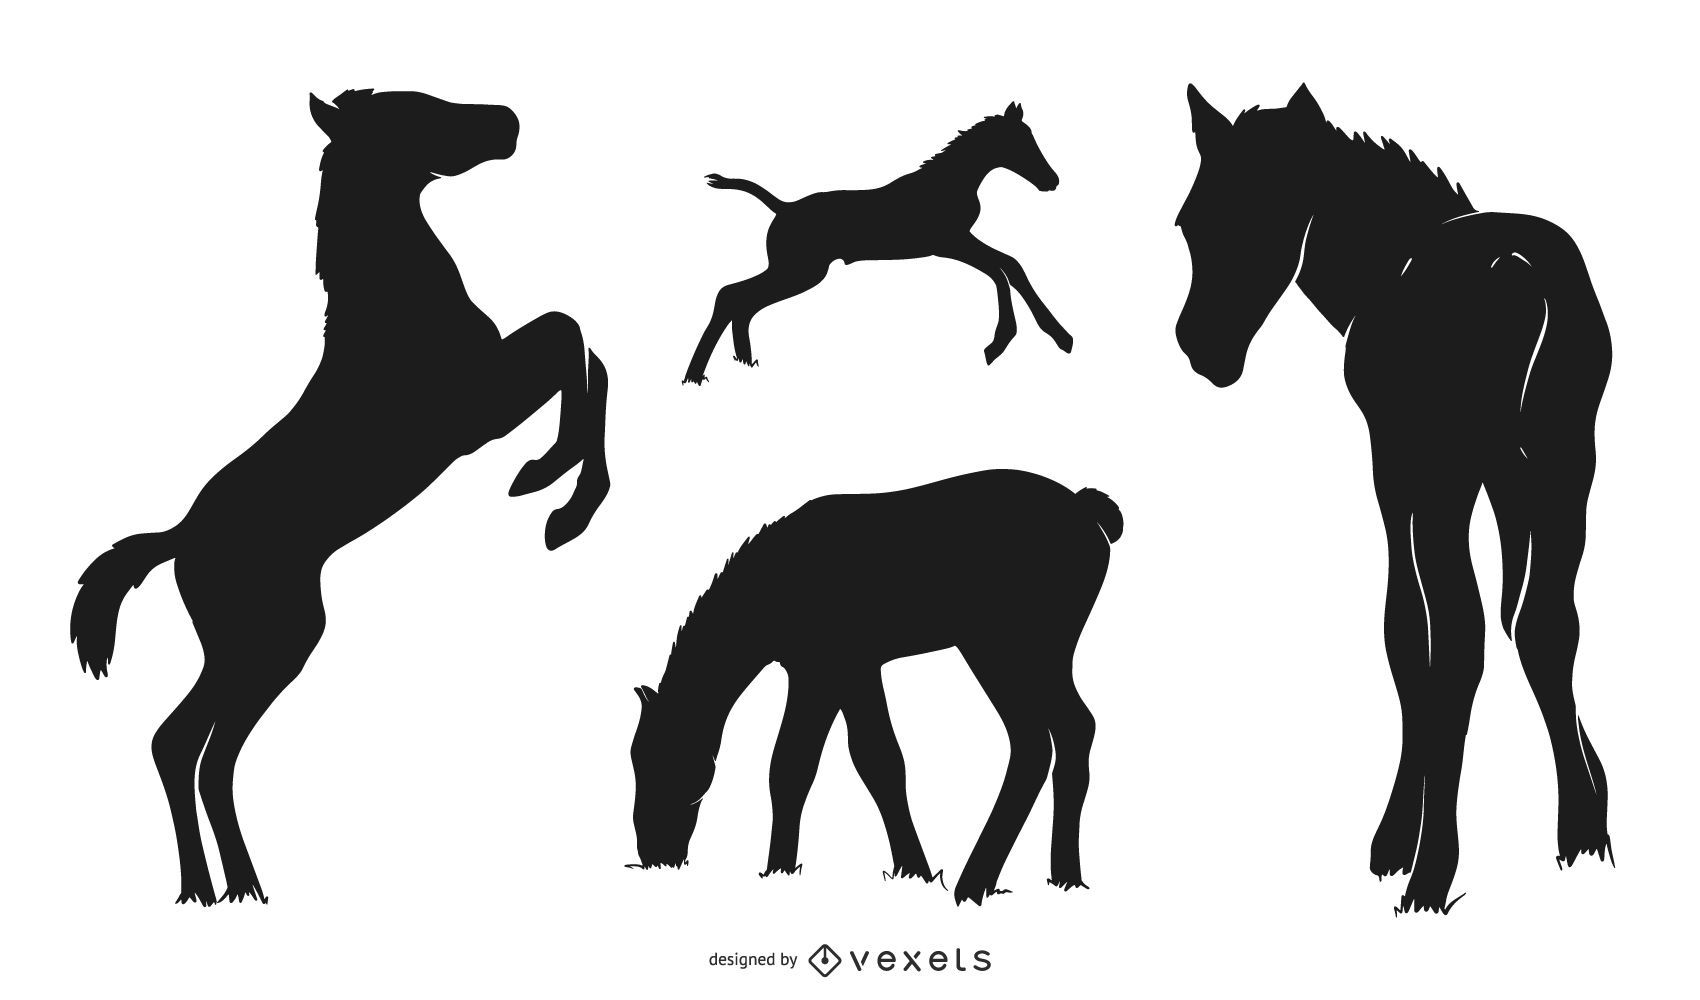 Horse Calf Silhouette Pack